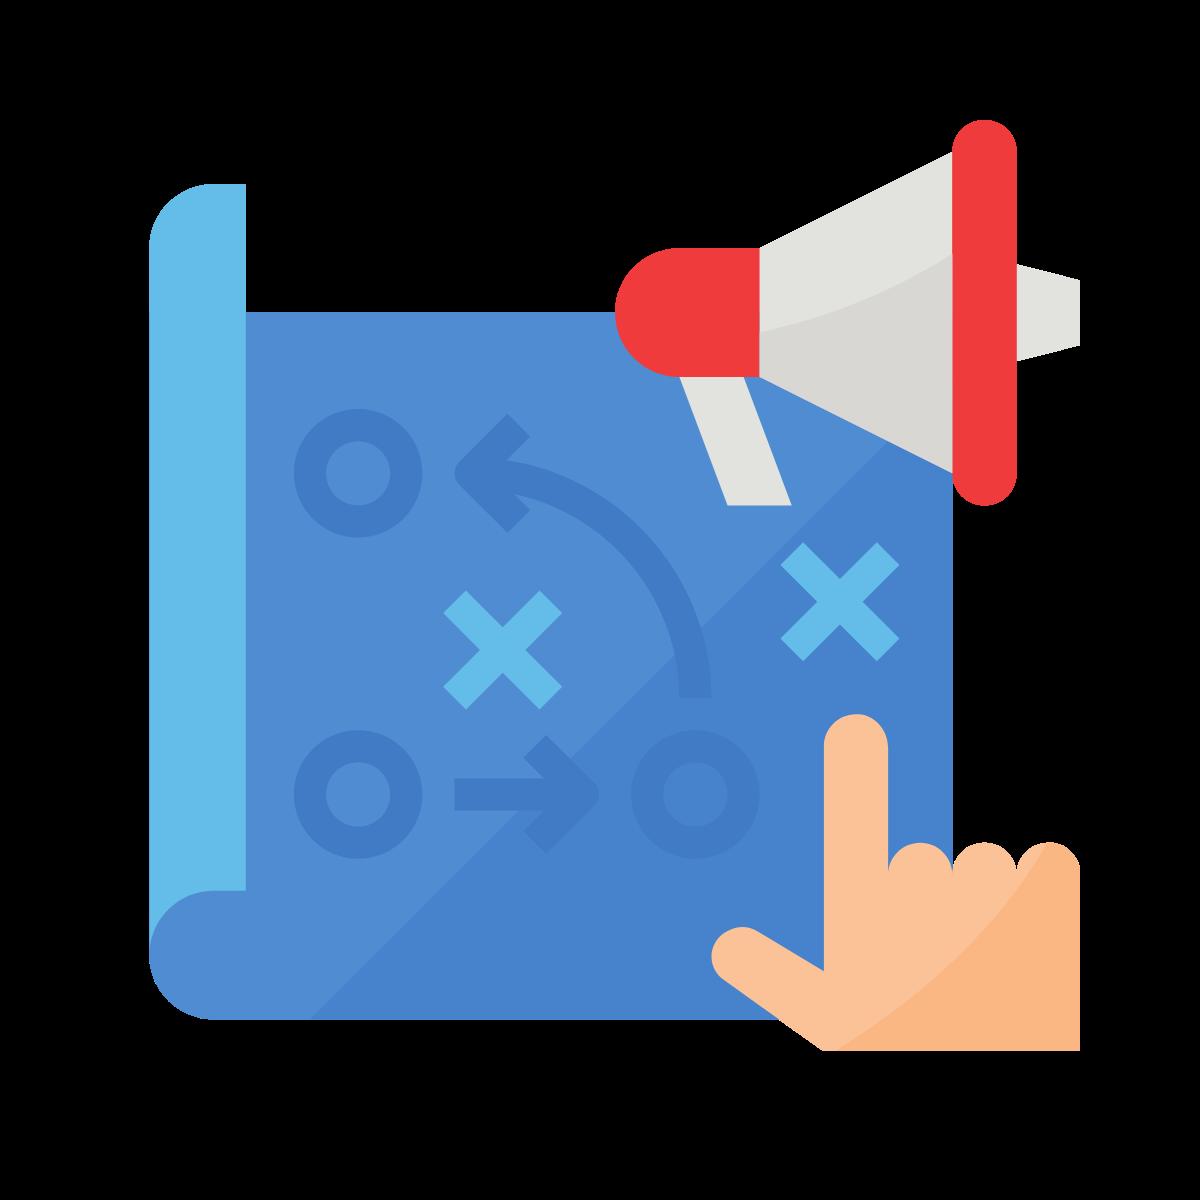 marketing executive job icon